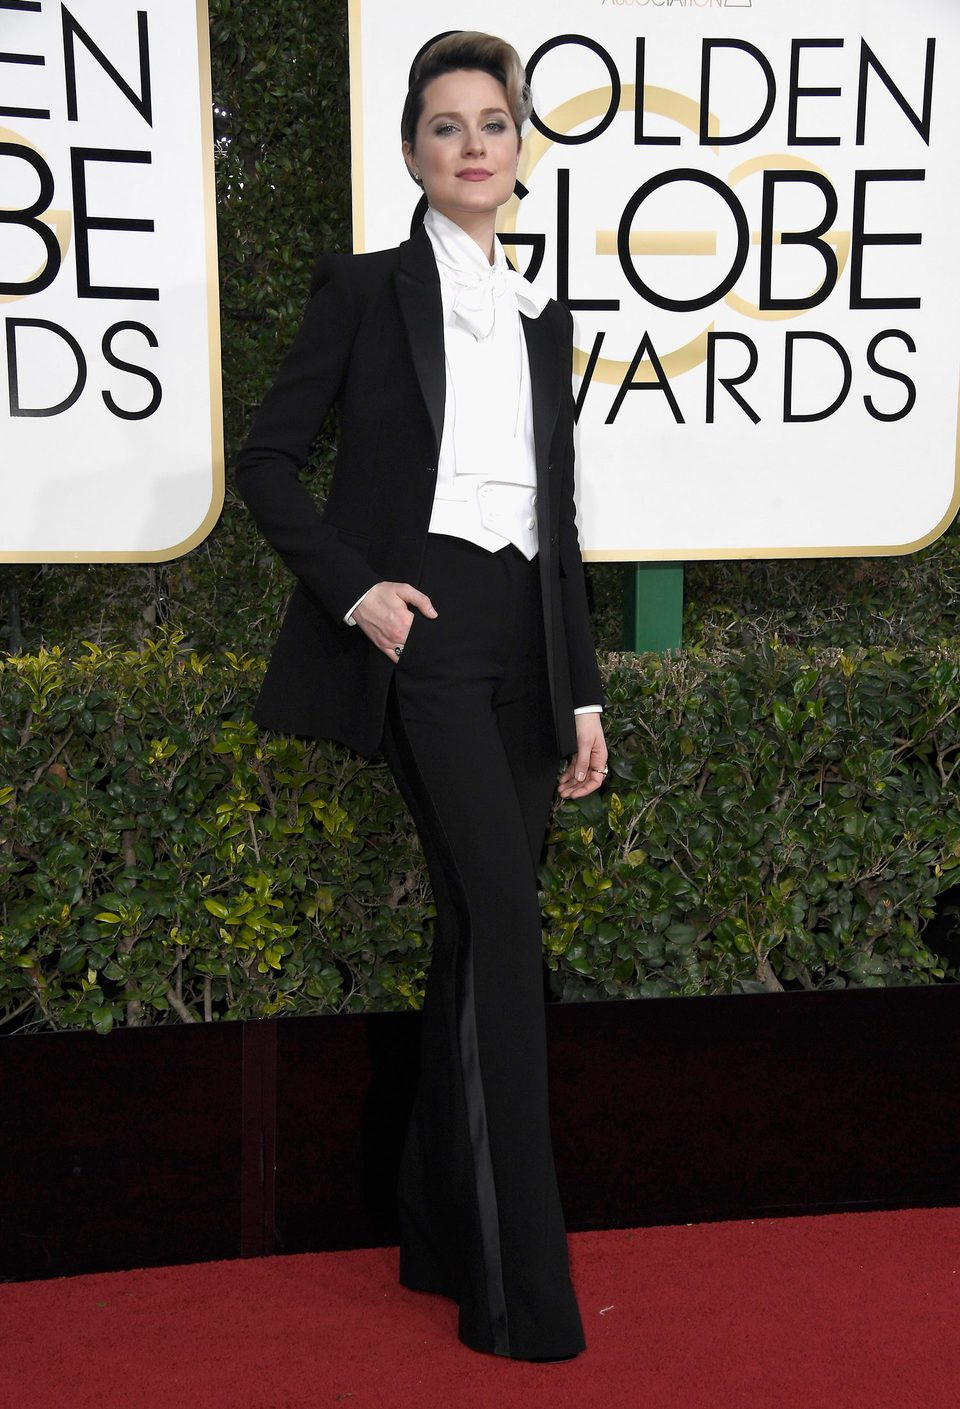 Evan Rachel Wood at Golden Globes 2017 red carpet